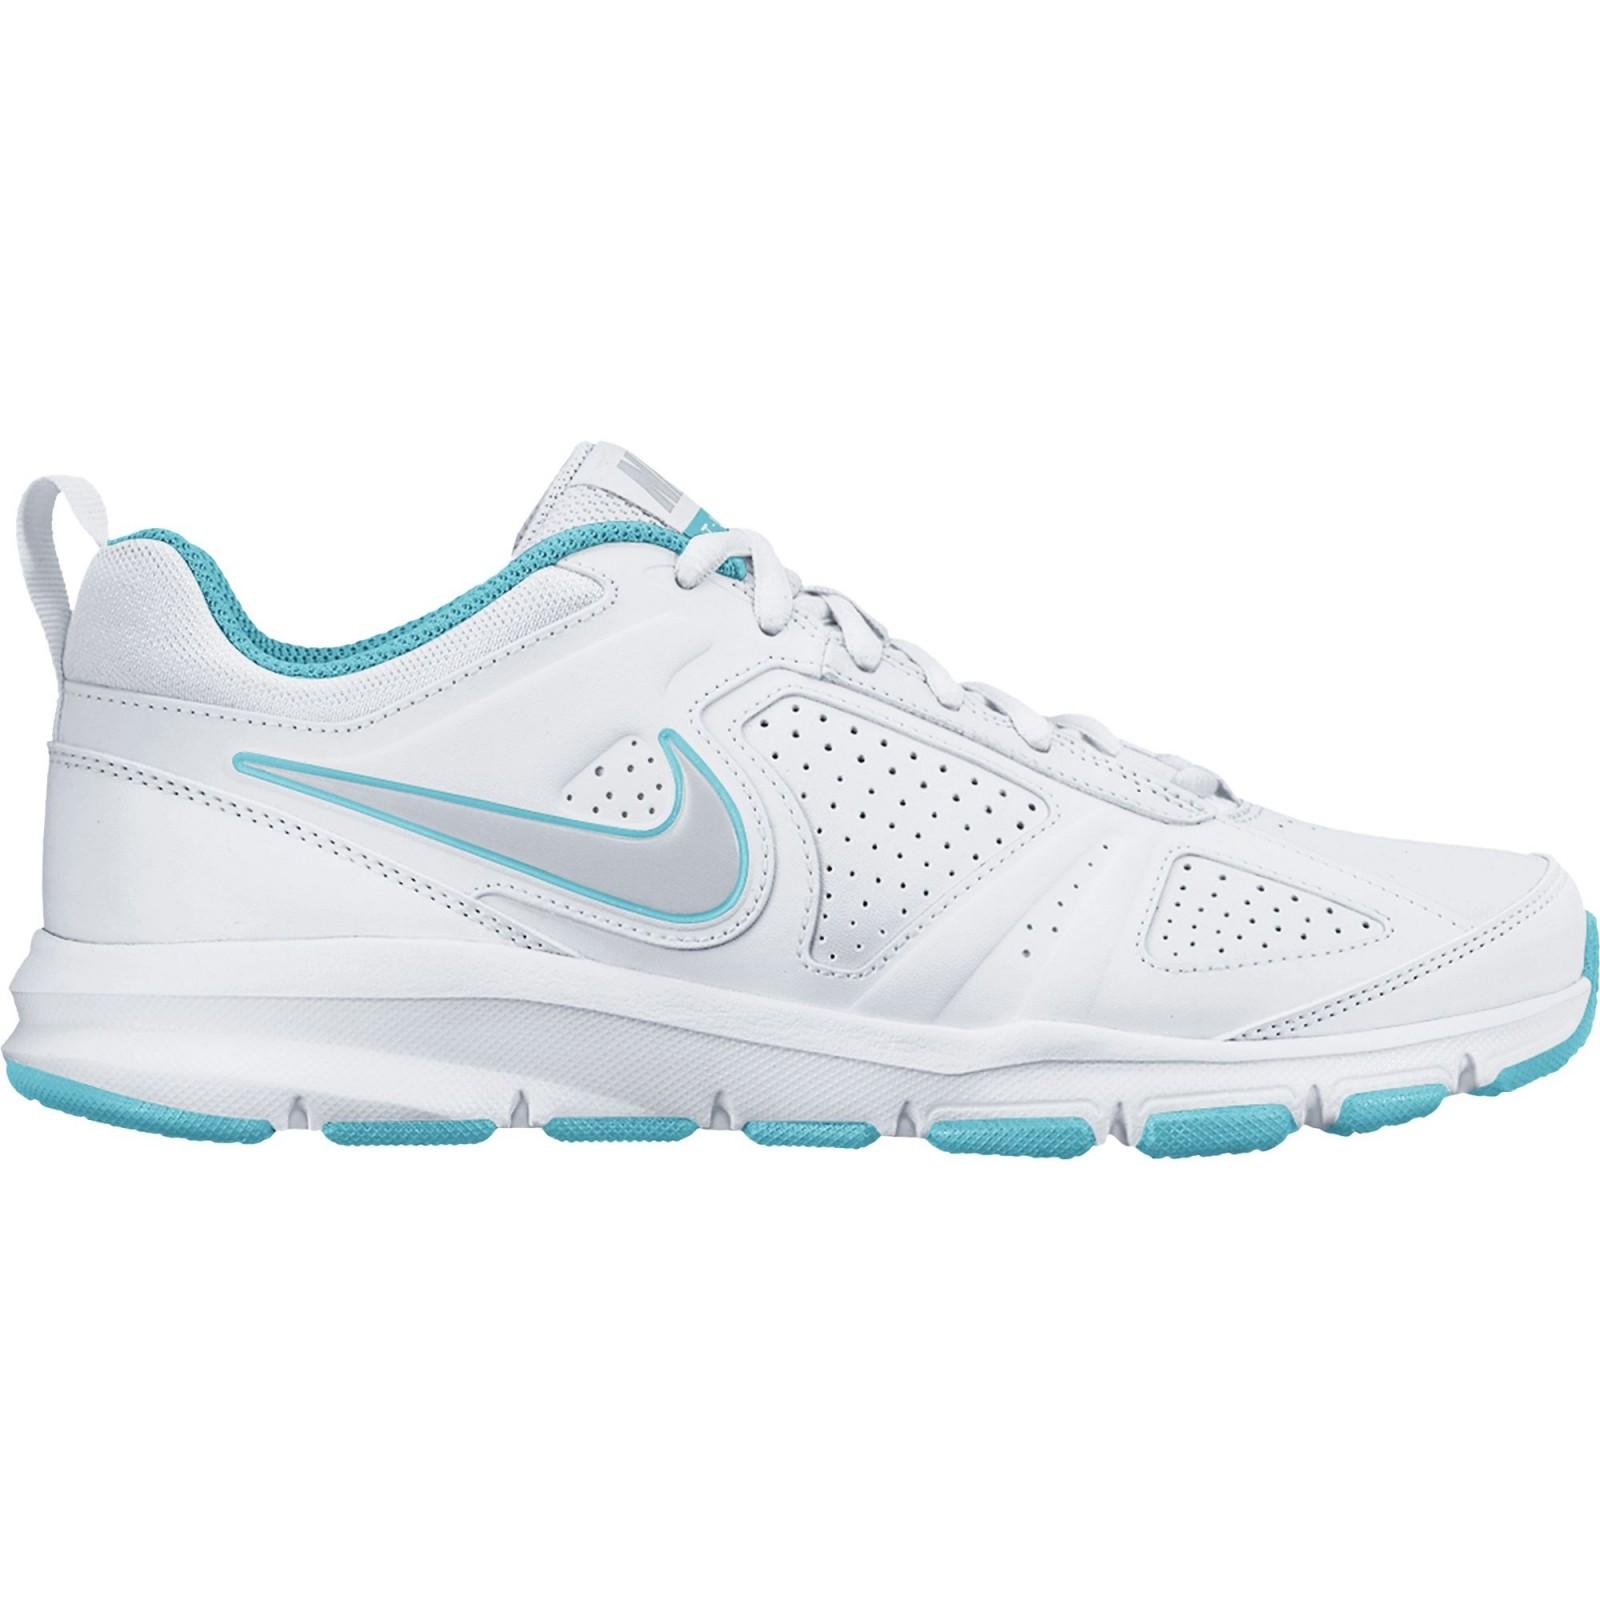 Dámská fitness obuv Nike WMNS T-LITE XI SL  b3609c52f94